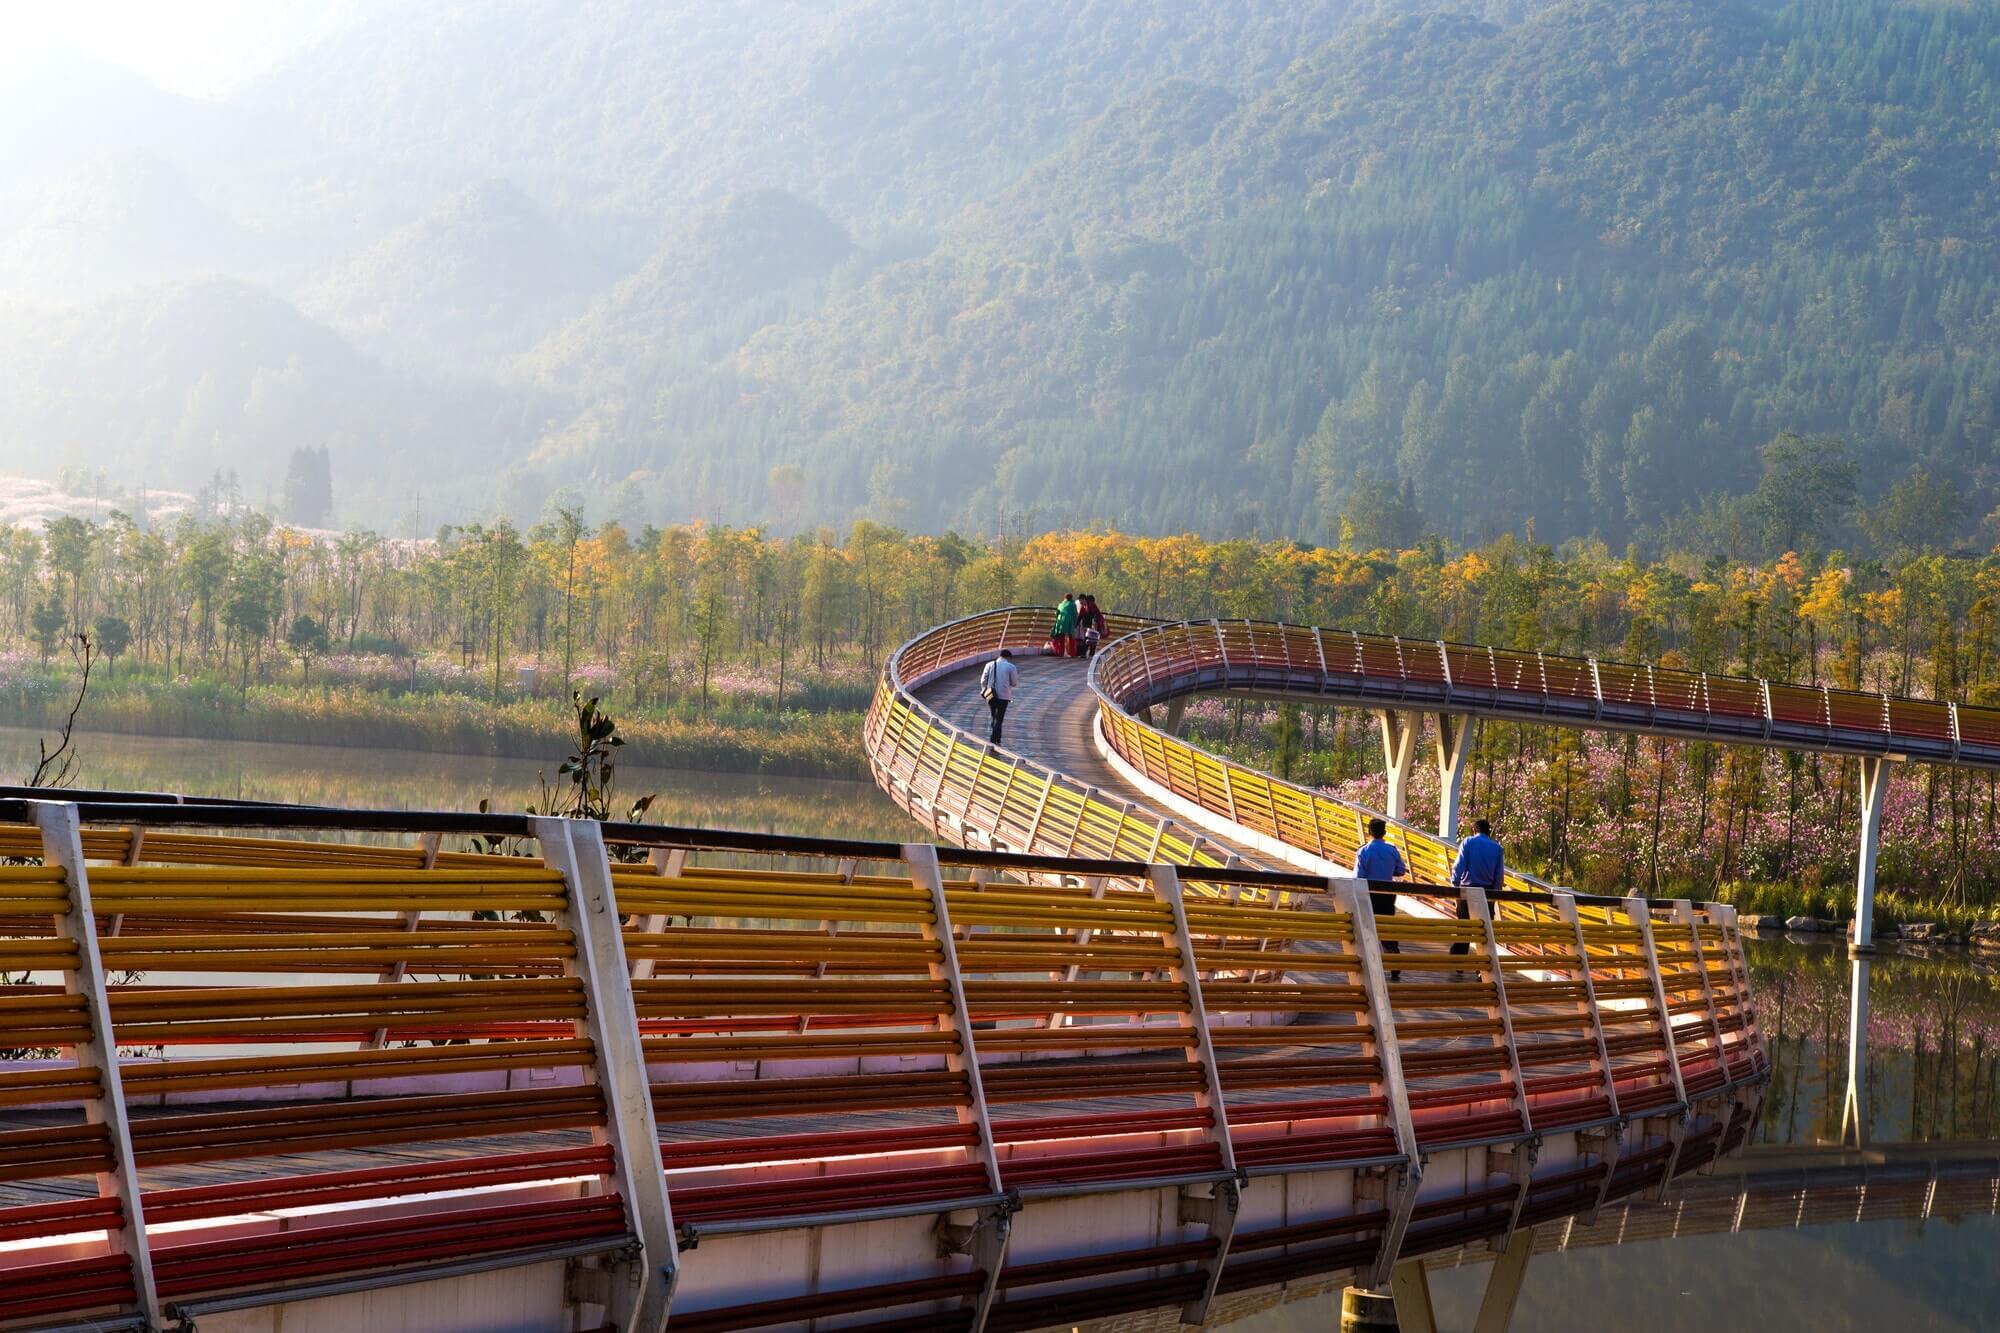 minghu-wetland-park